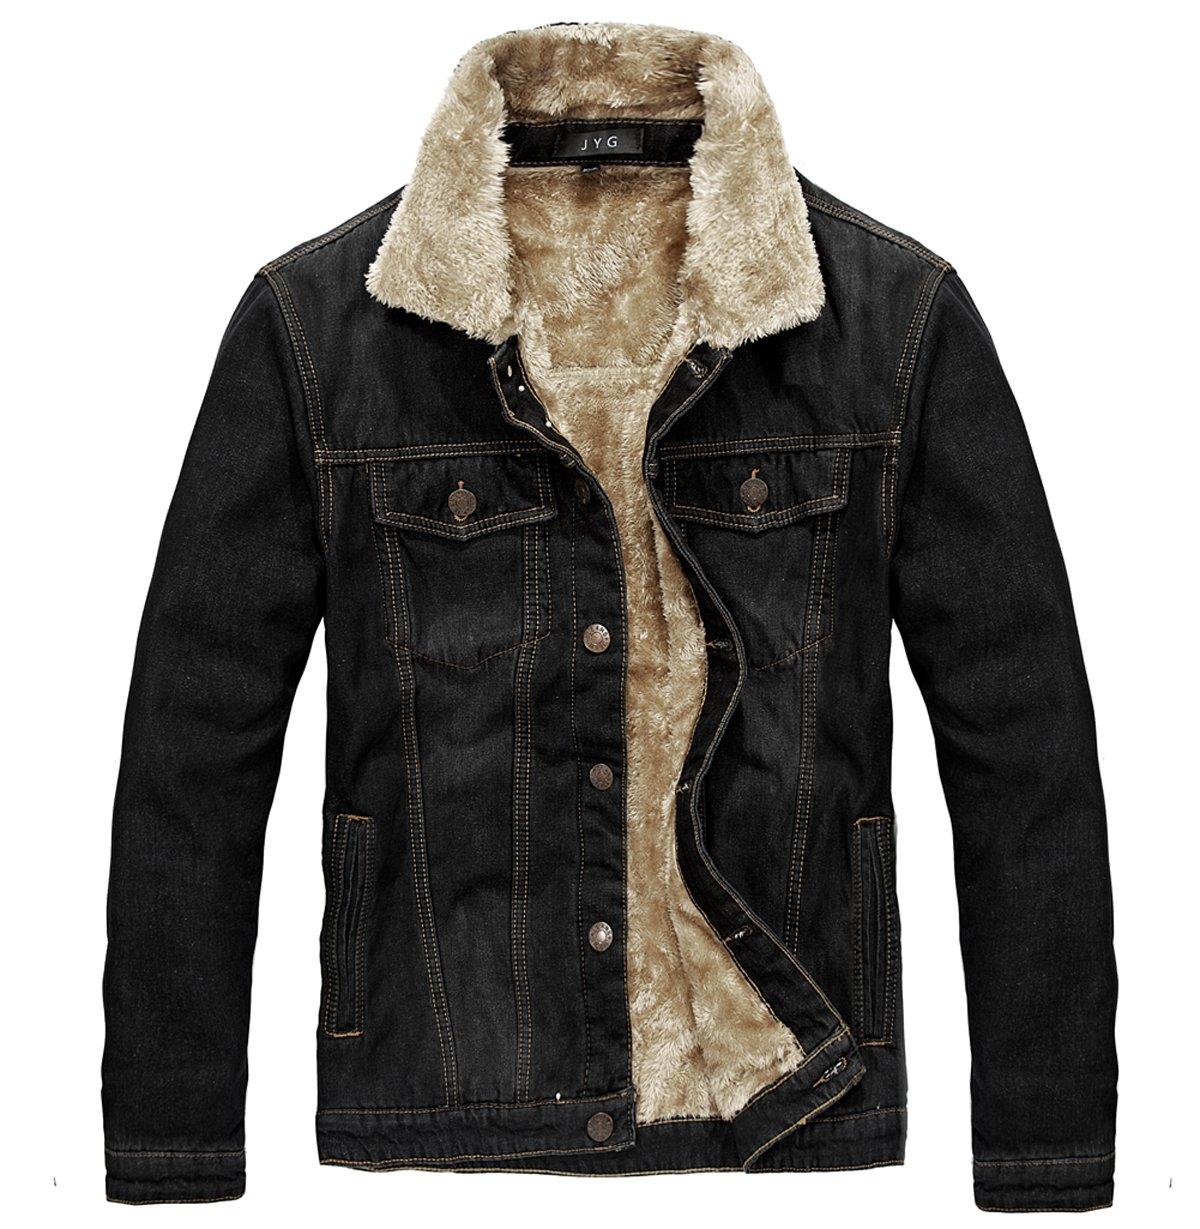 JYG Men's Winter Thicken Sherpa Lined Denim Jacket by JYG